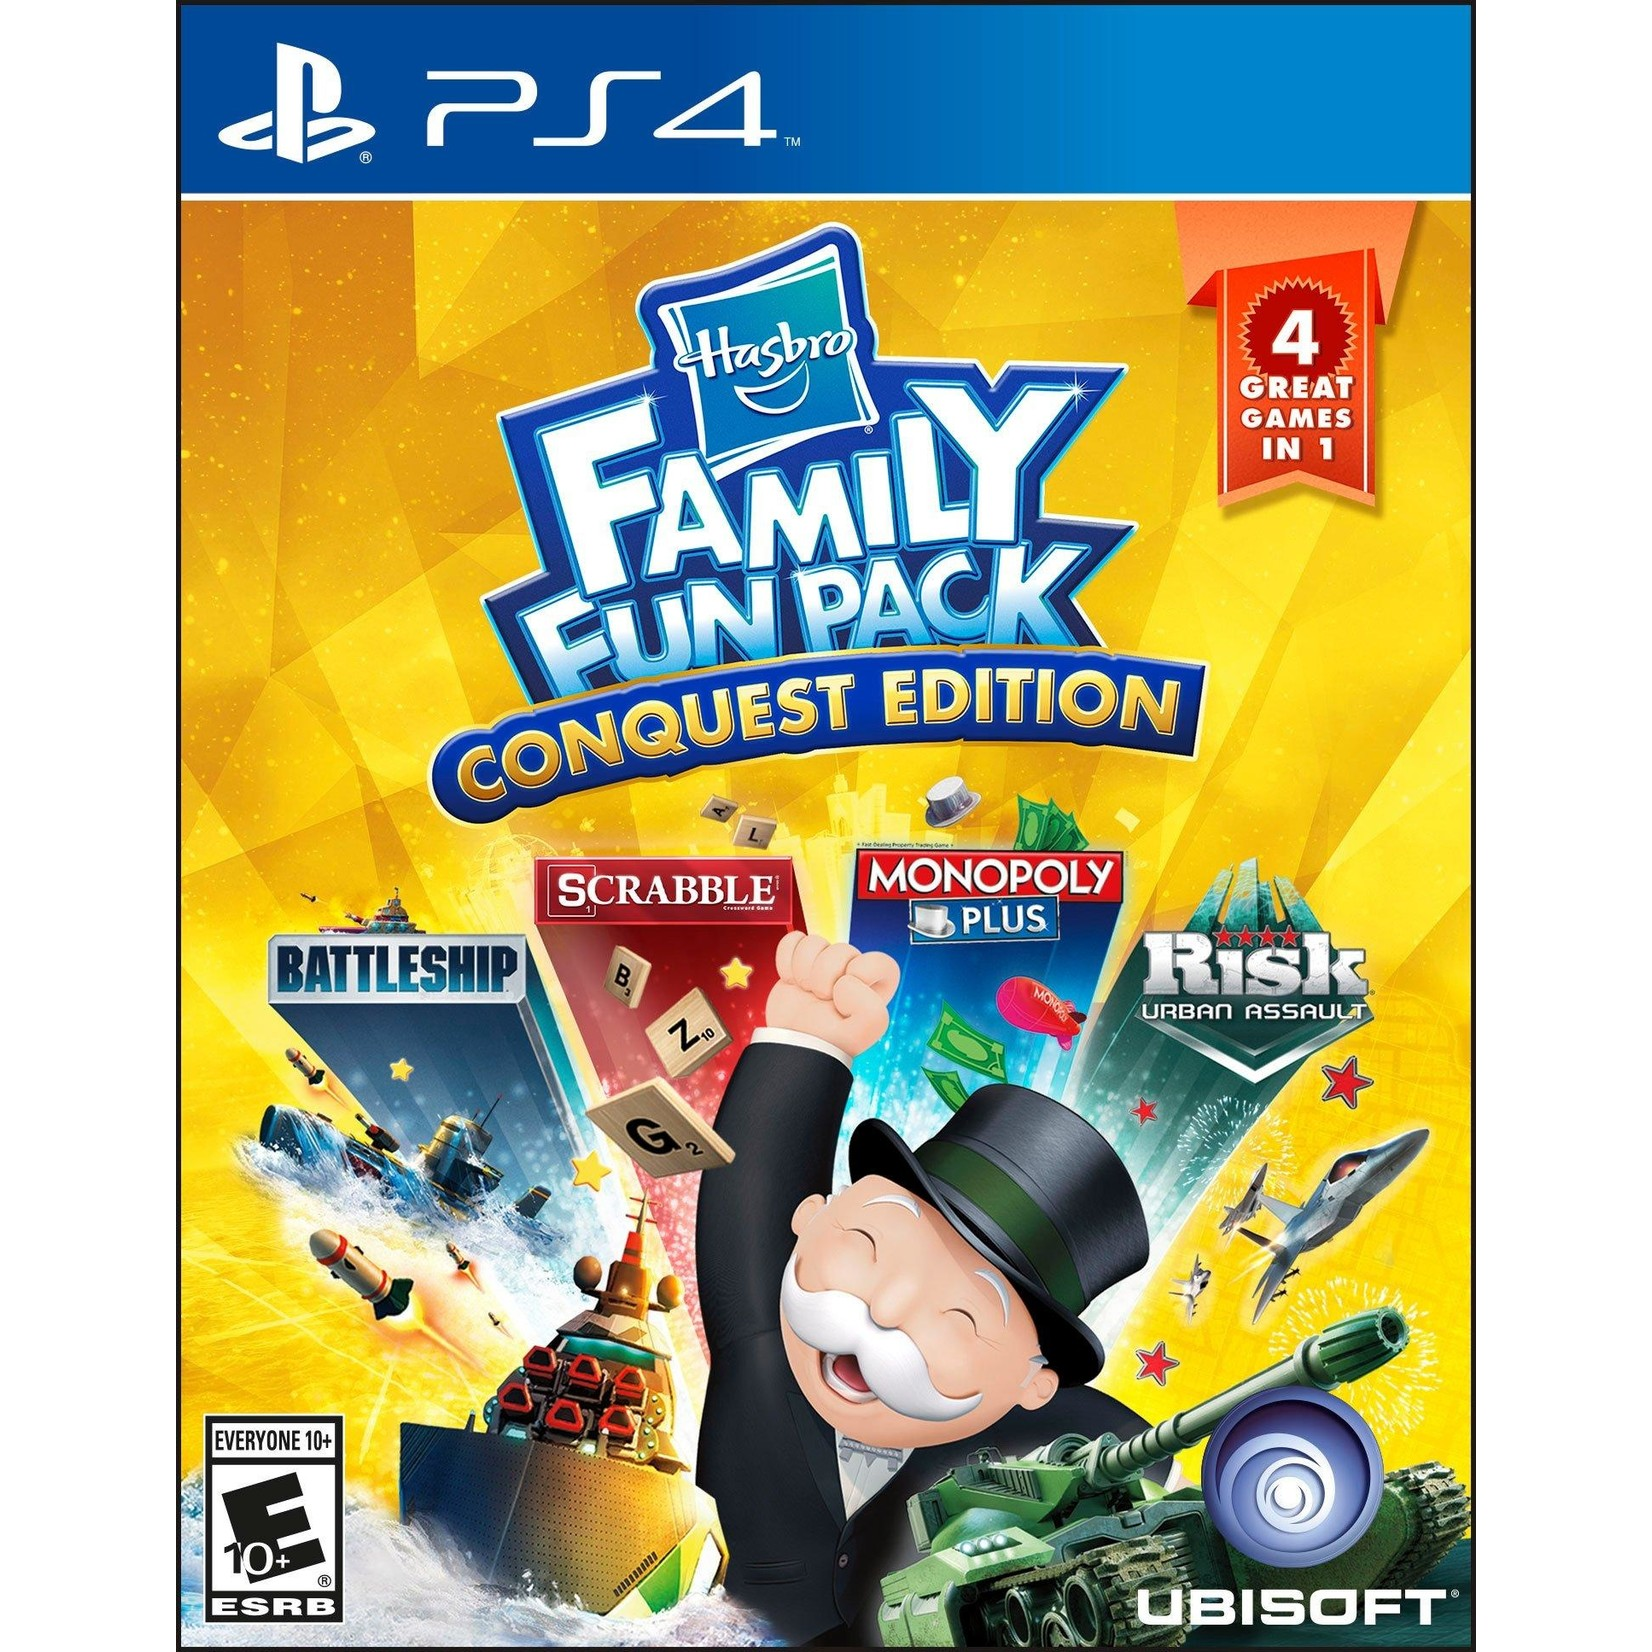 PS4U-HASBRO FAMILY FUN PACK CONQUEST